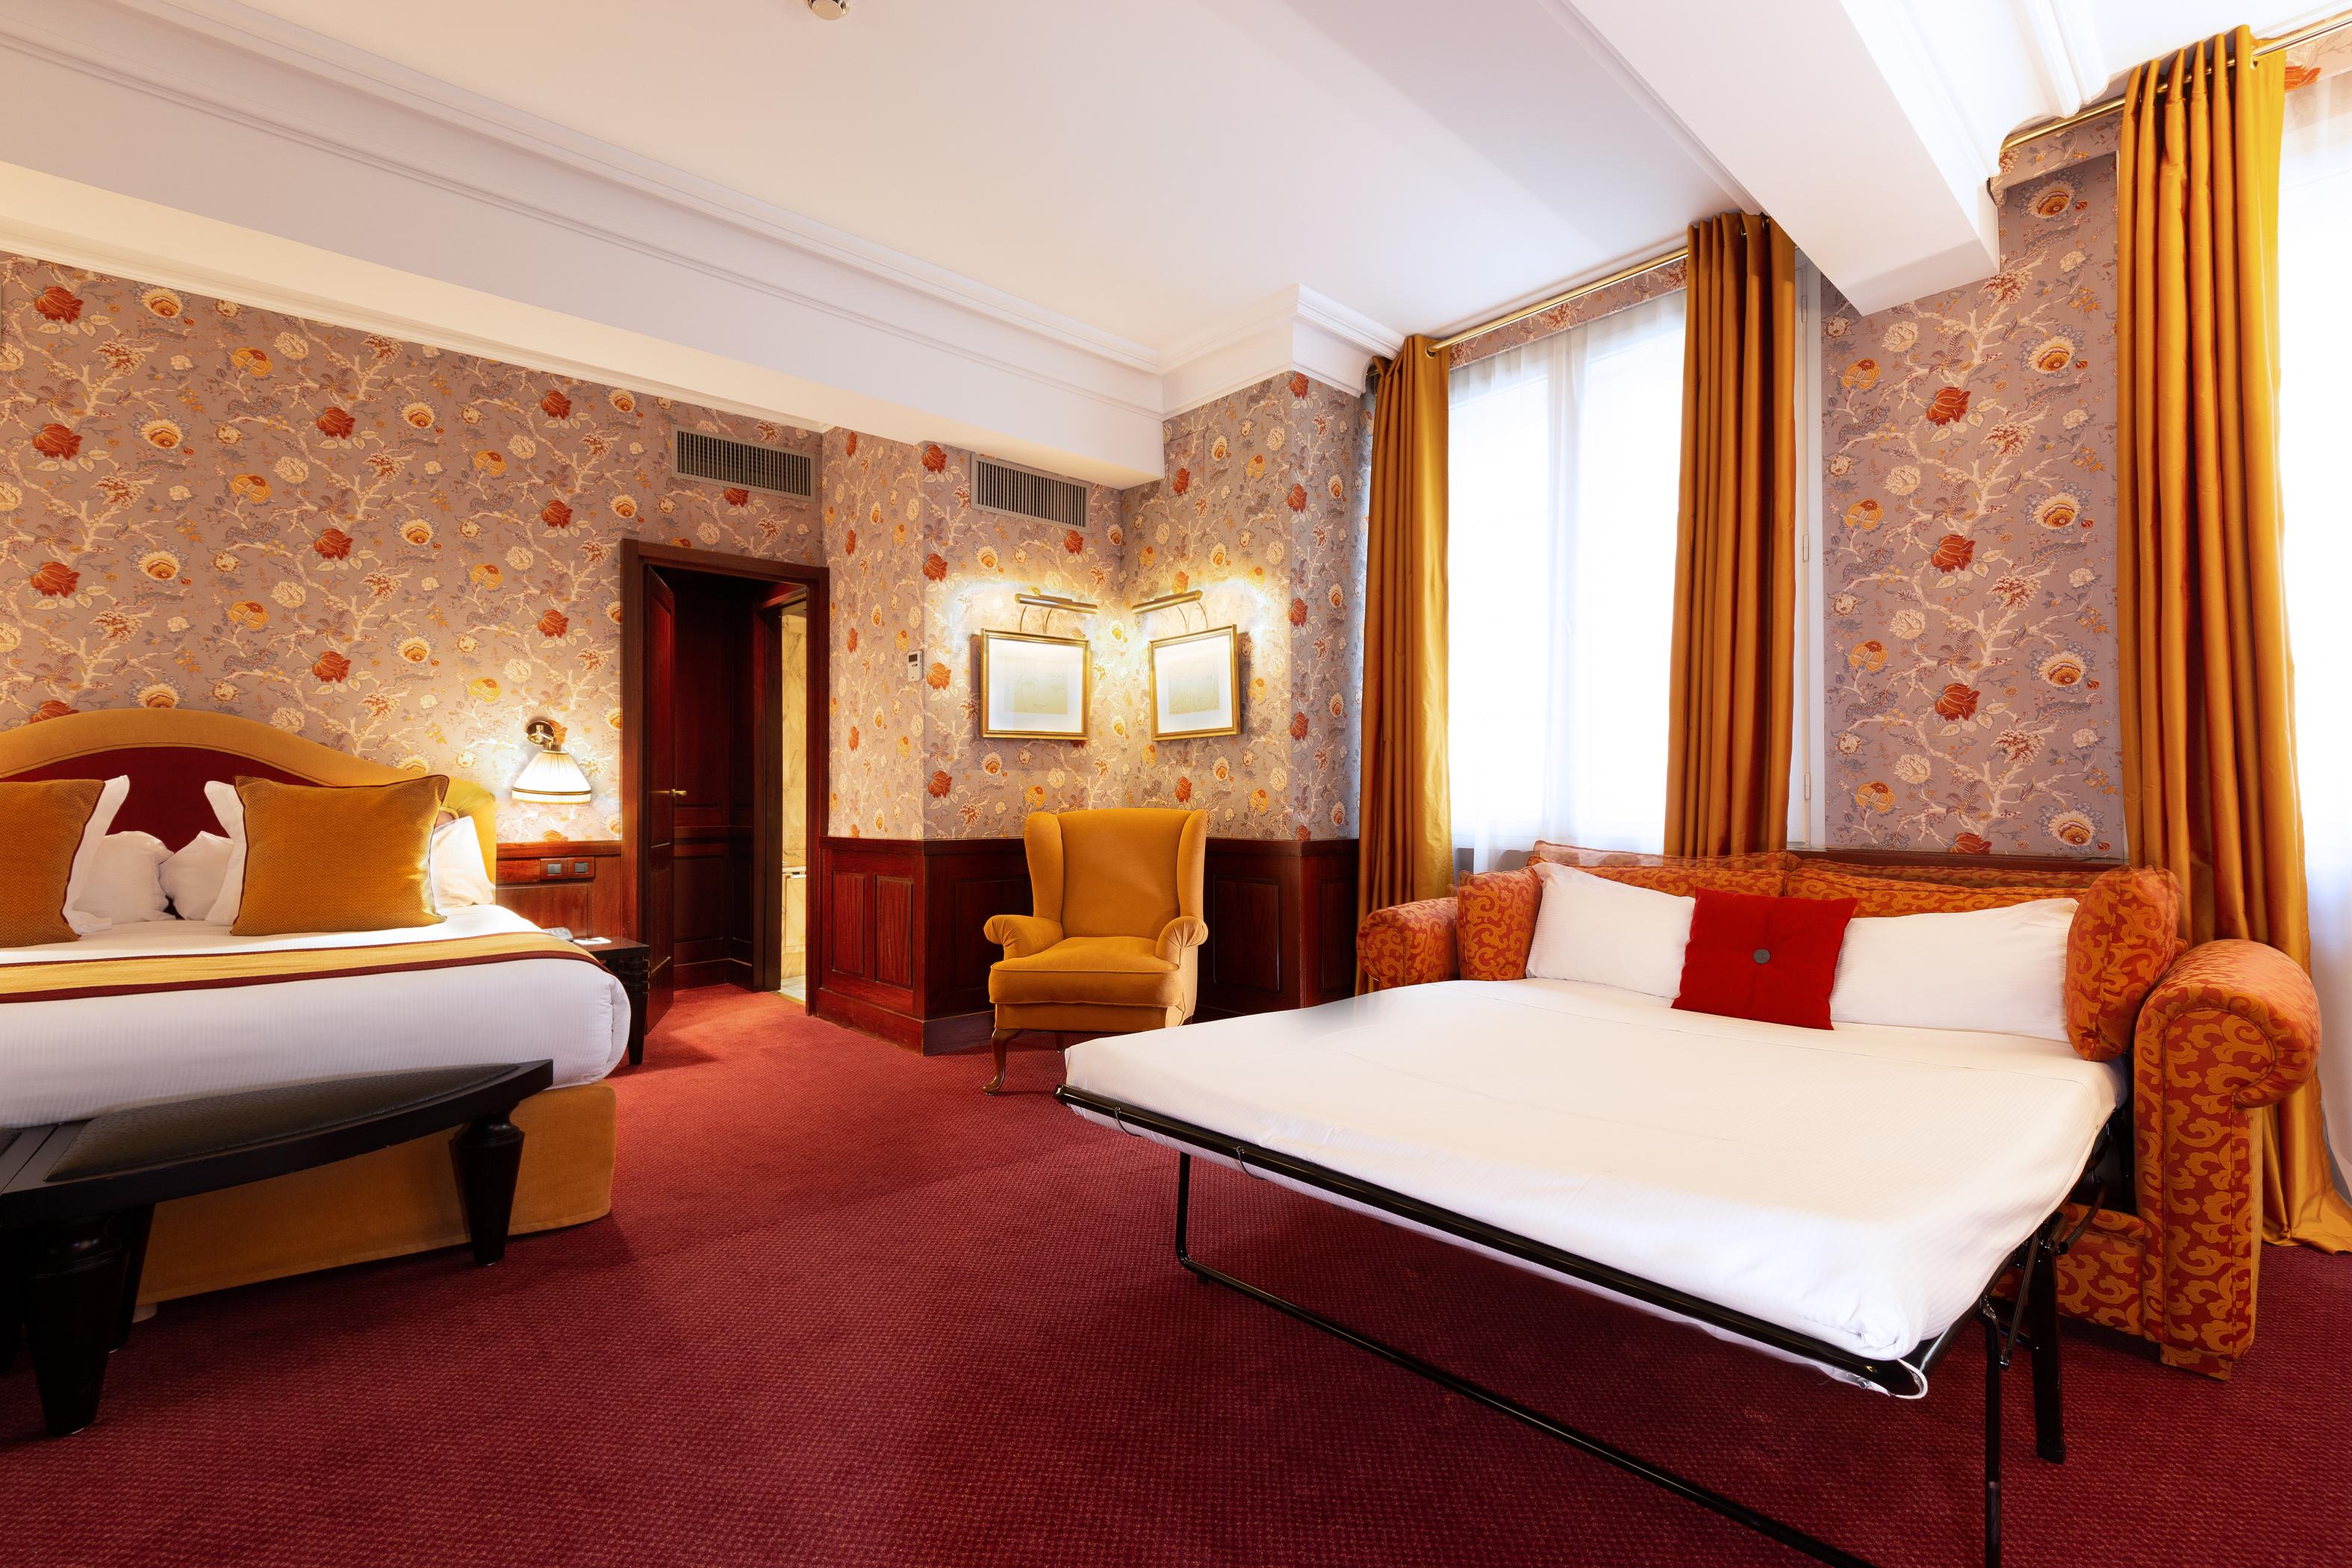 Chambre Deluxe privilège familiale-hotel luxe toulouse